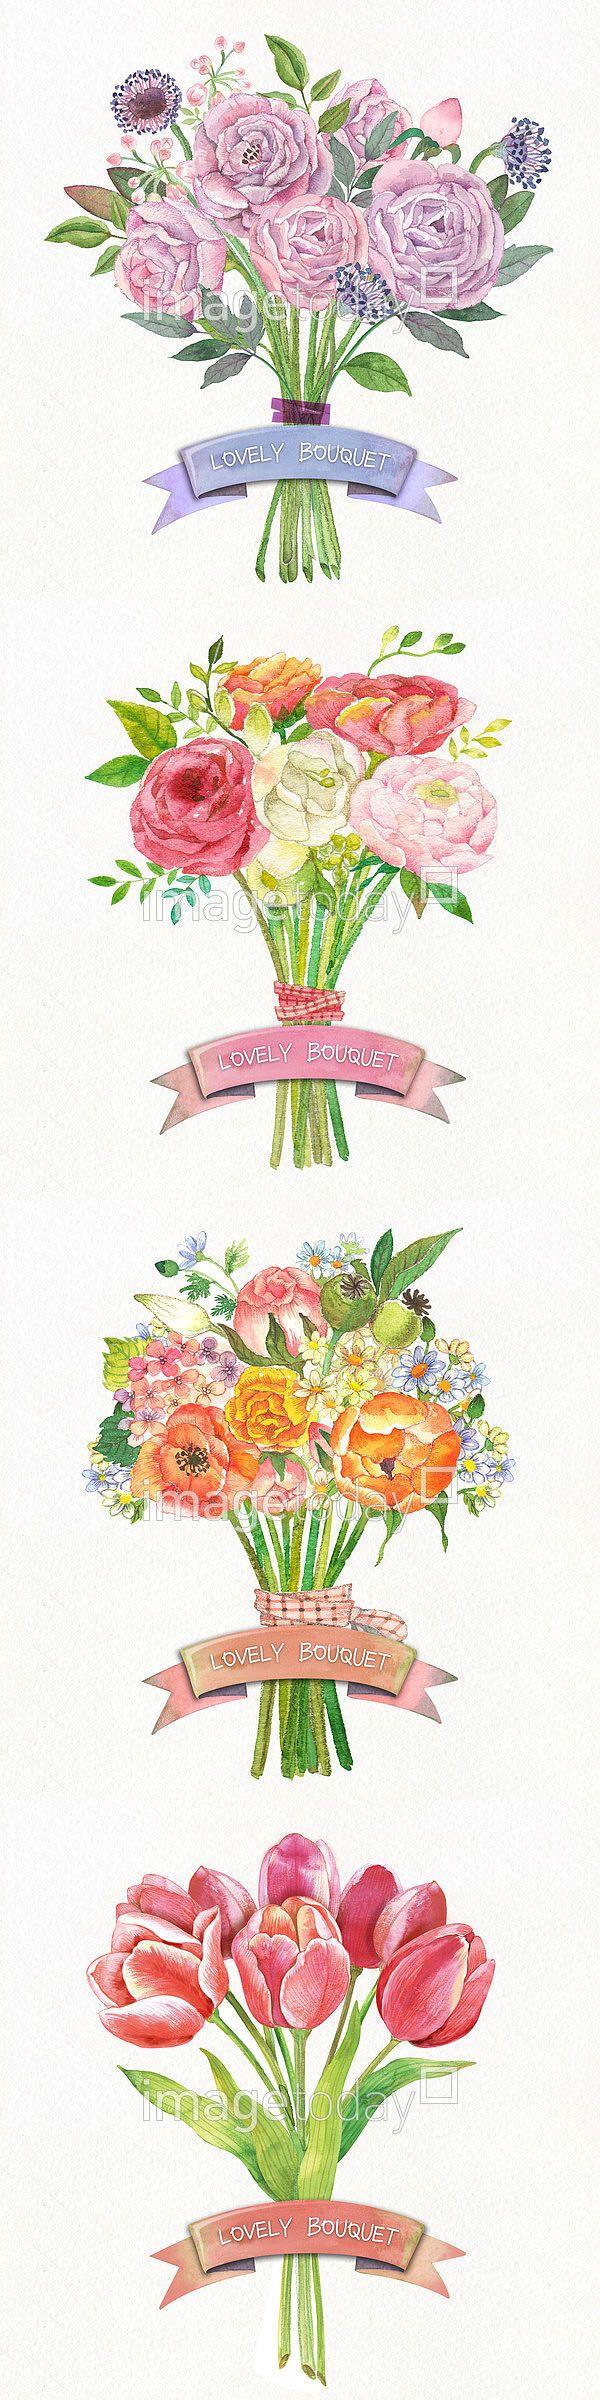 PSD 결혼 꽃 꽃다발 리본 백그라운드 부케 빨간색 수채화 식물 아름다움 오브젝트 튤립 페인터 합성이미지 장미 PSD wedding flowers bouquet ribbon watercolor blue background object plant tulip beauty Painter composite image roses #이미지투데이 #imagetoday #클립아트코리아 #clipartkorea #통로이미지 #tongroimages